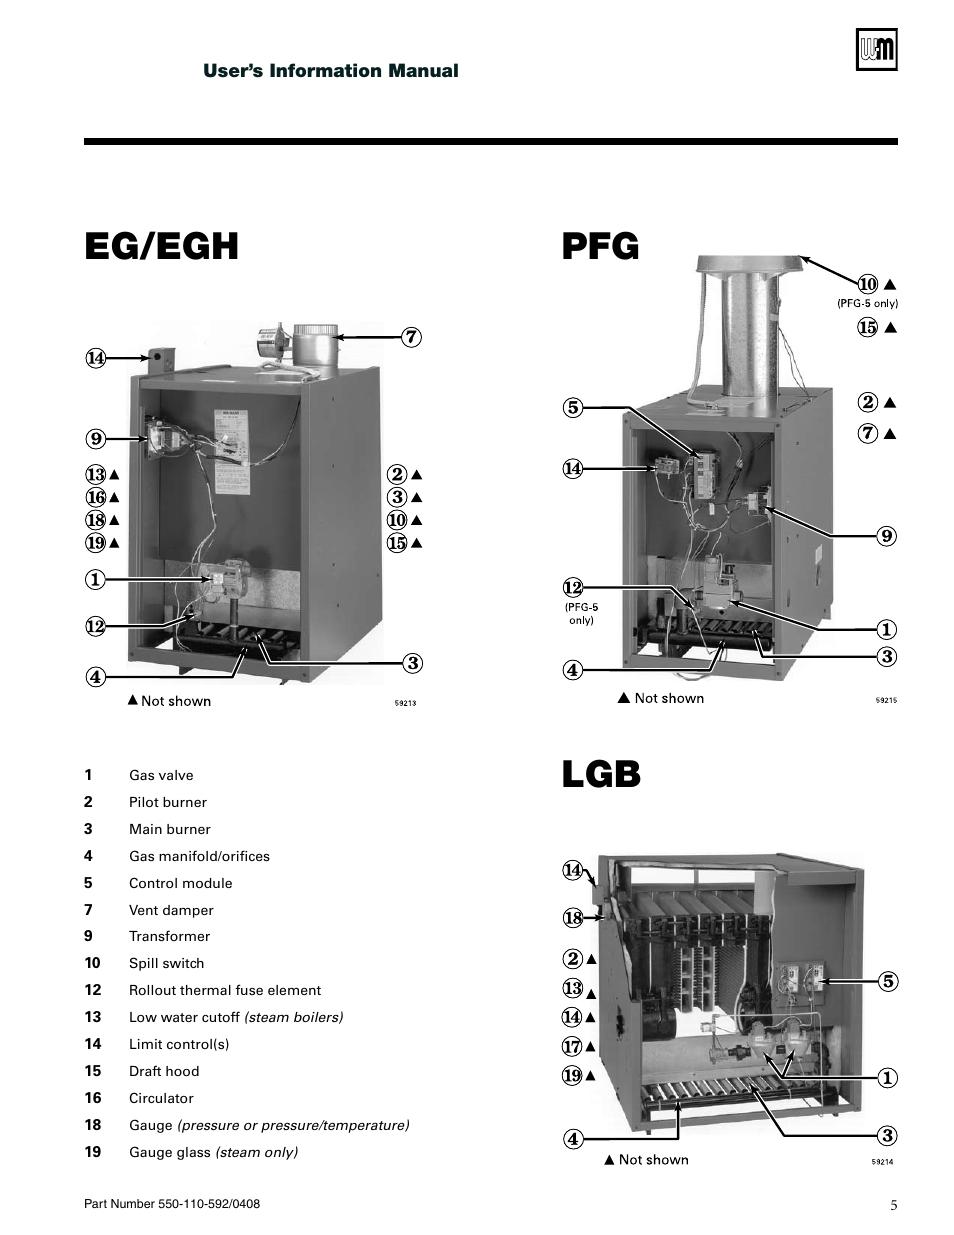 Eg Egh Pfg Lgb Weil Mclain Cga User Manual Page 5 24 Boiler Wiring Diagram